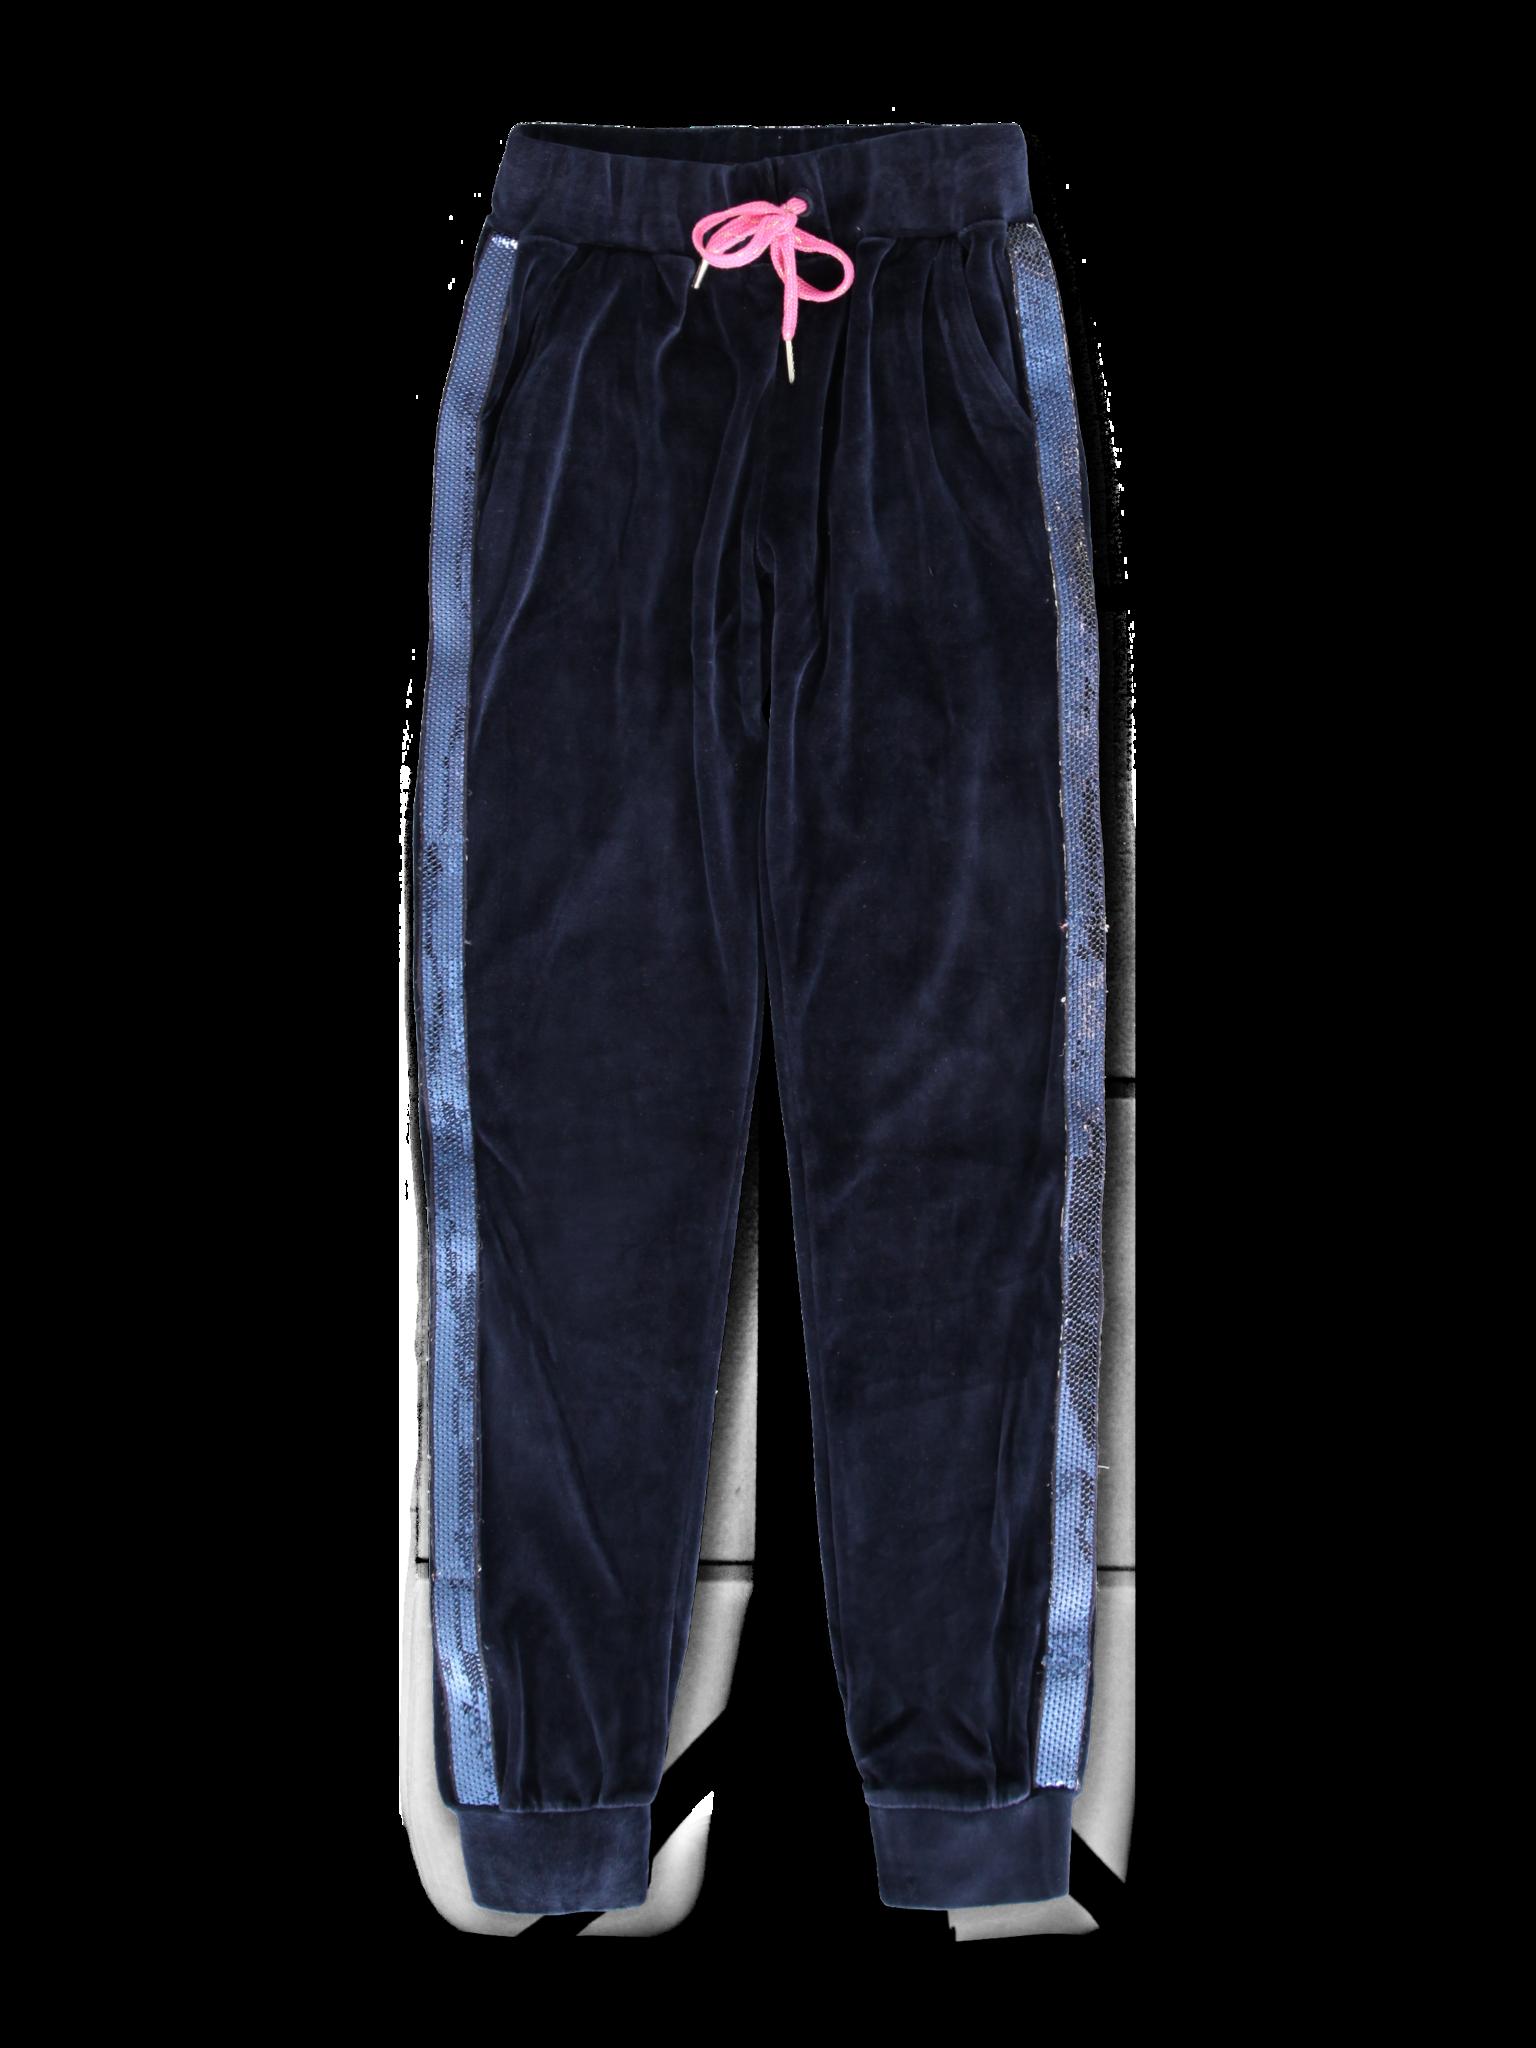 All Brands | Winterproducts Teen Girls | Jogging Pant | 12 pcs/box